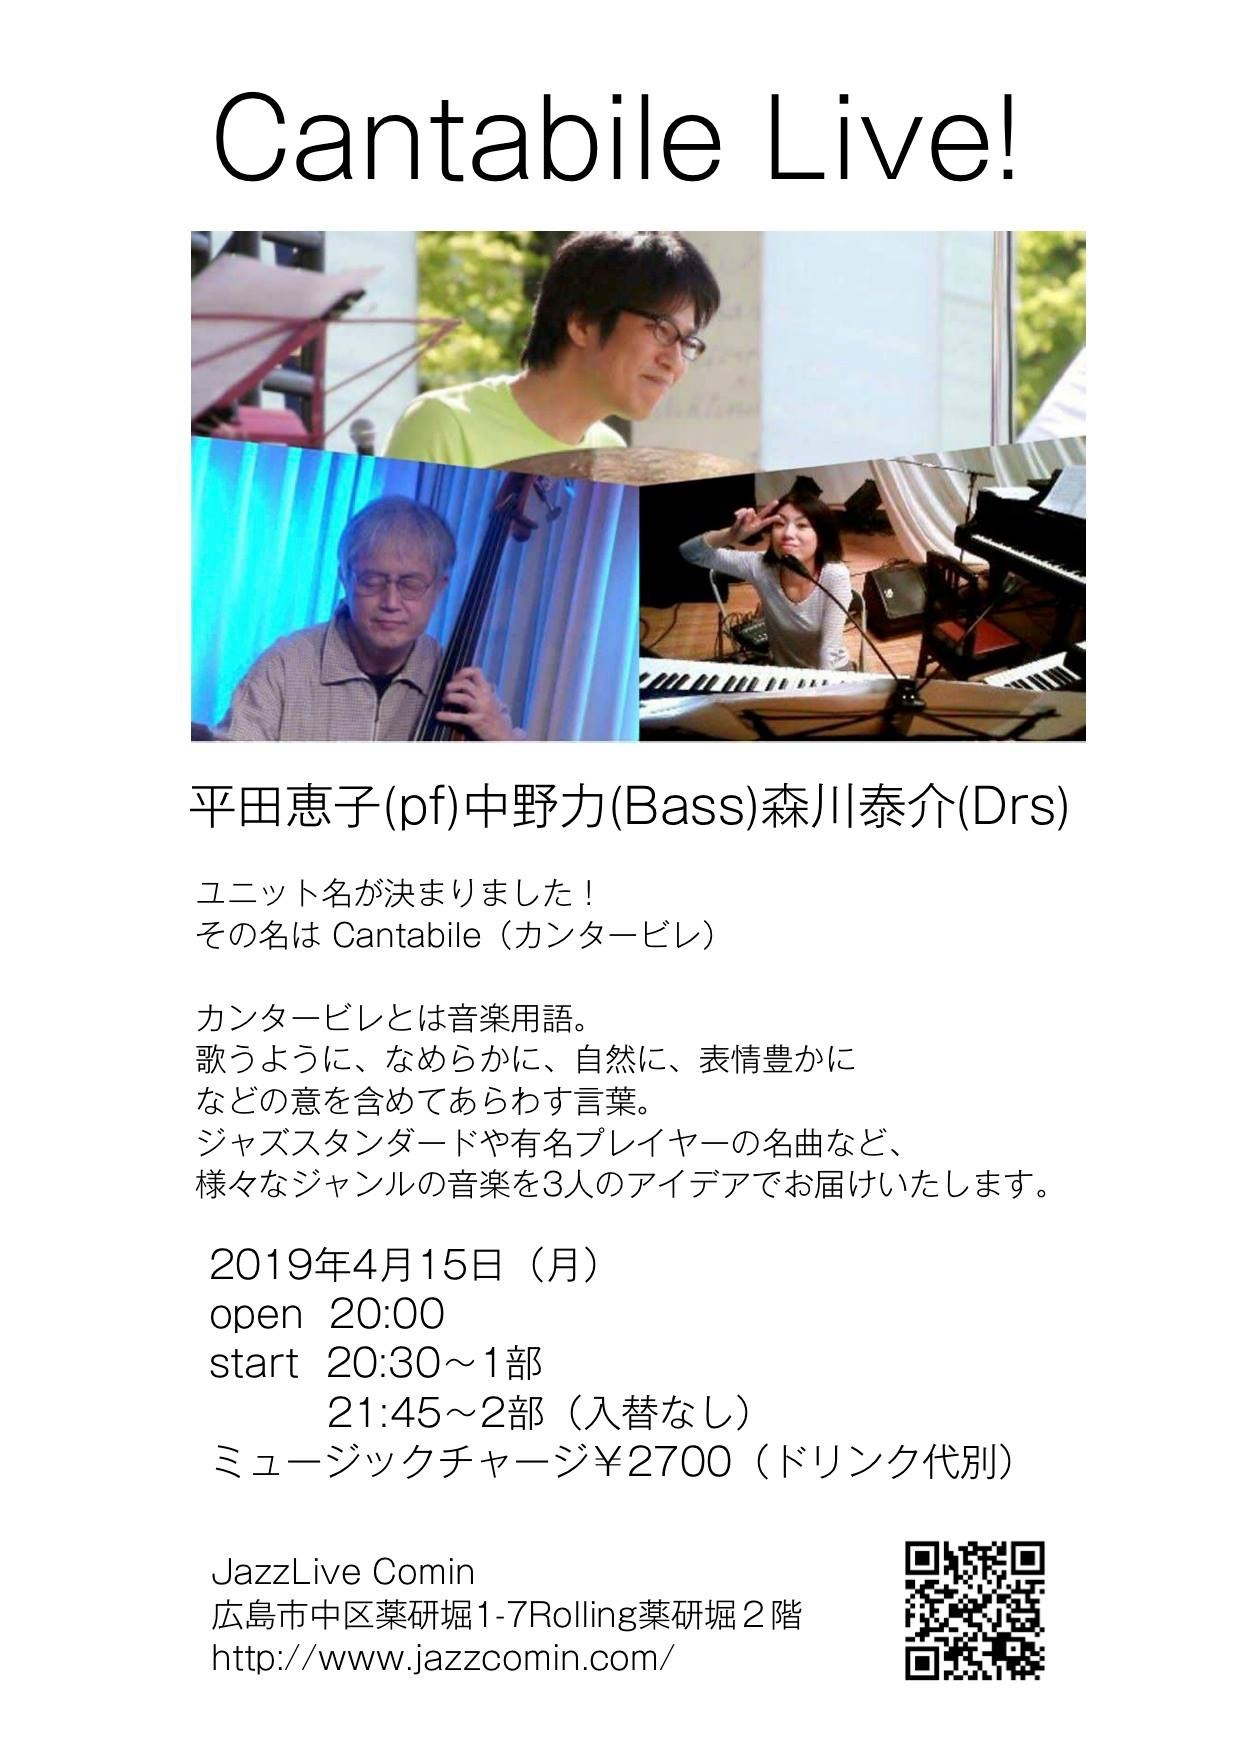 Jazzlive comin 広島 明日月曜日のライブ!_b0115606_11472454.jpeg